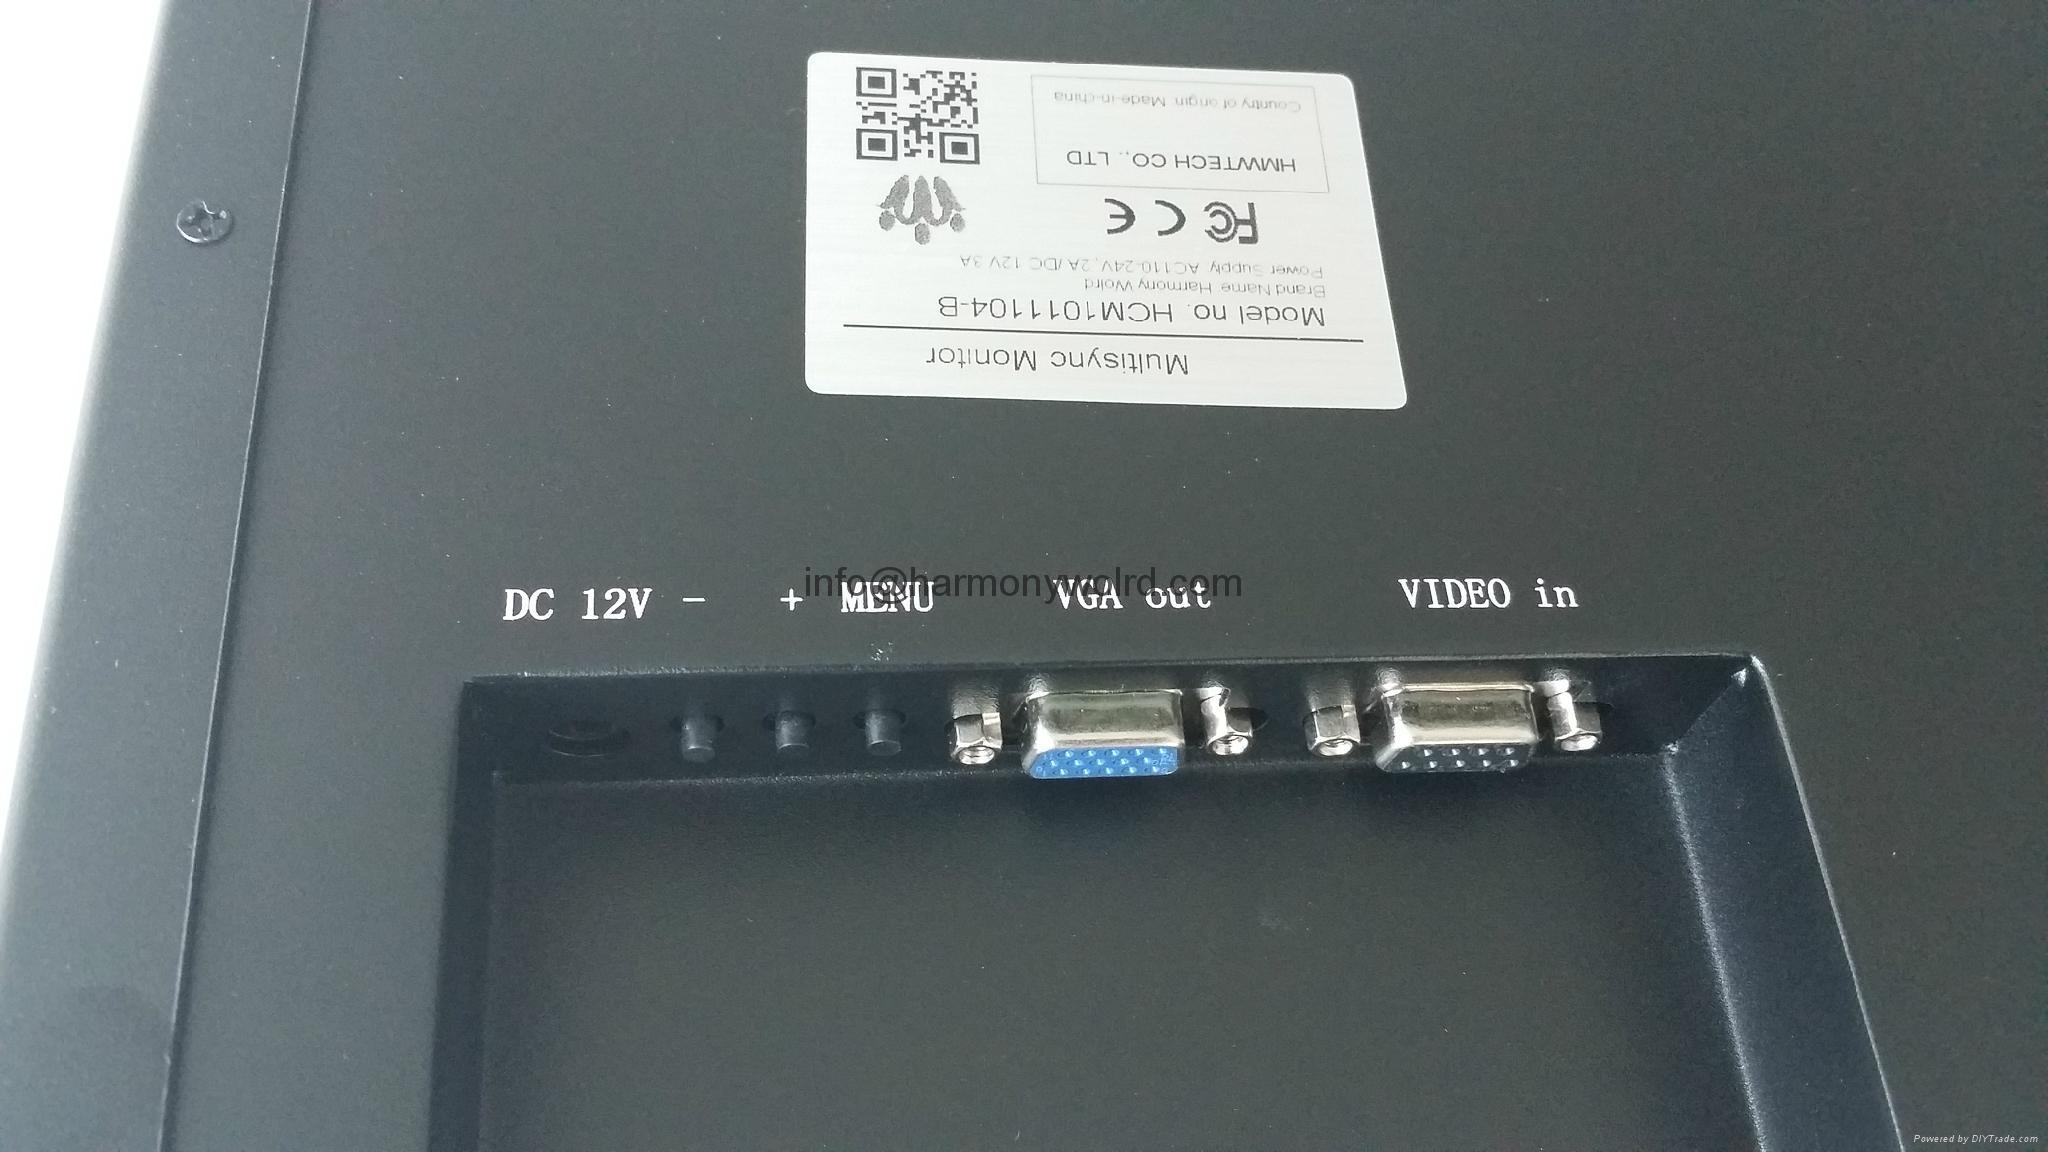 Upgrade Allen Bradley Monitors 916724-08 958671-02 CM-1210 D12CX73 CRT To LCDs  9